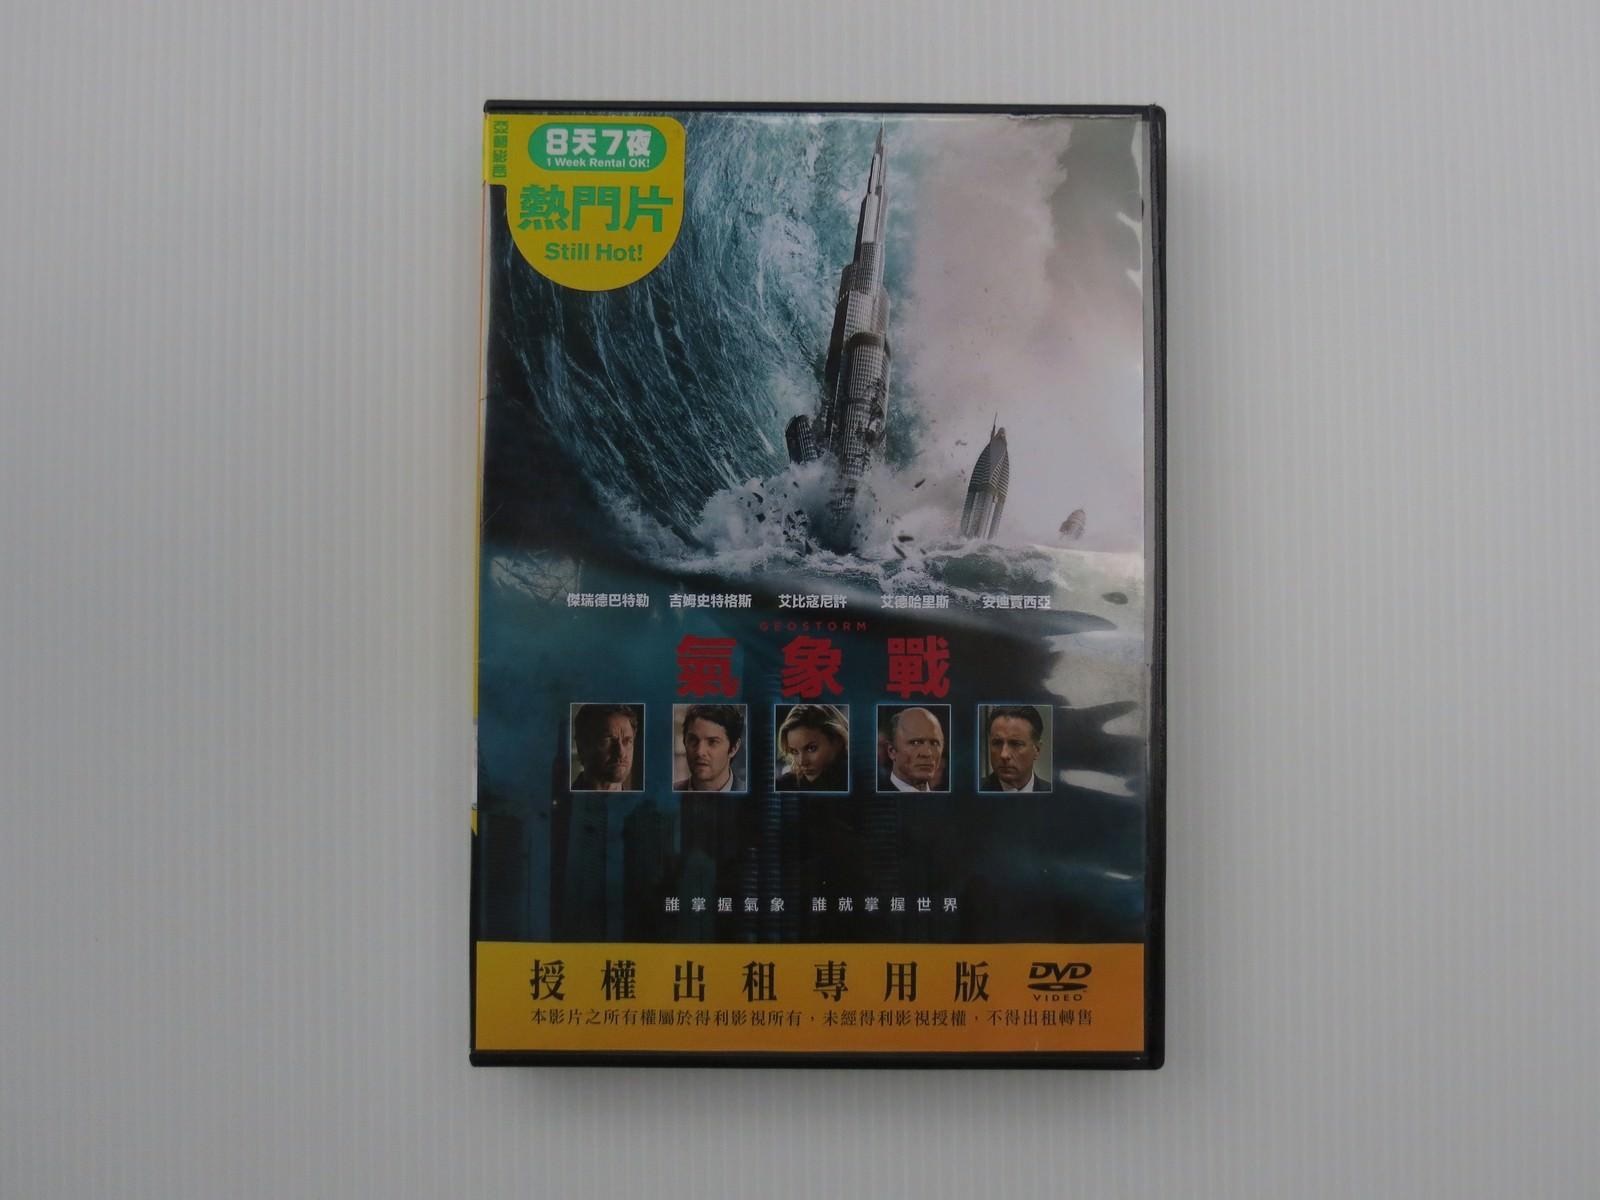 Movie, Geostorm(美國) / 氣象戰(台) / 全球风暴(中) / 人造天劫(港), DVD